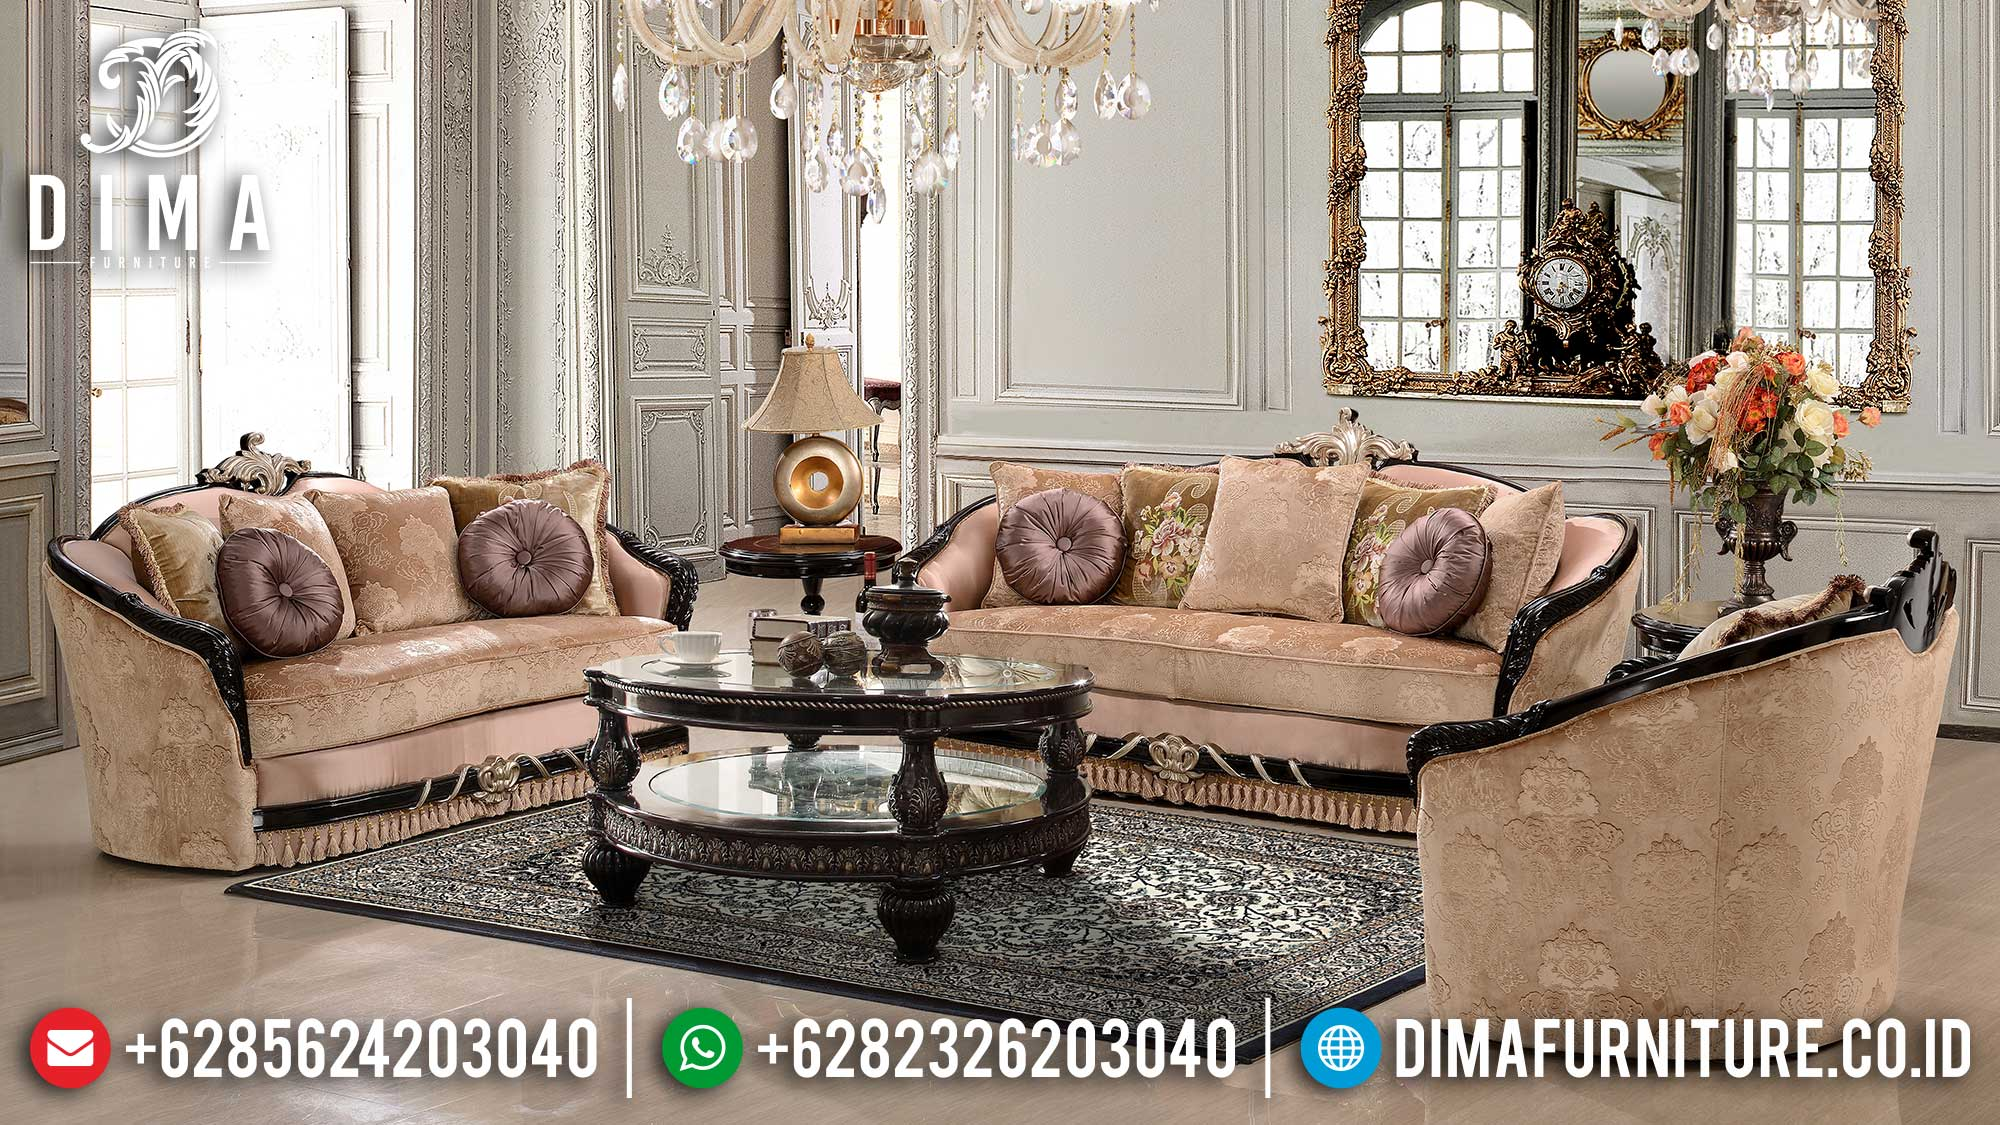 New Model Sofa Tamu Mewah Jepara Luxurious Premiere Classic Ttj-1526